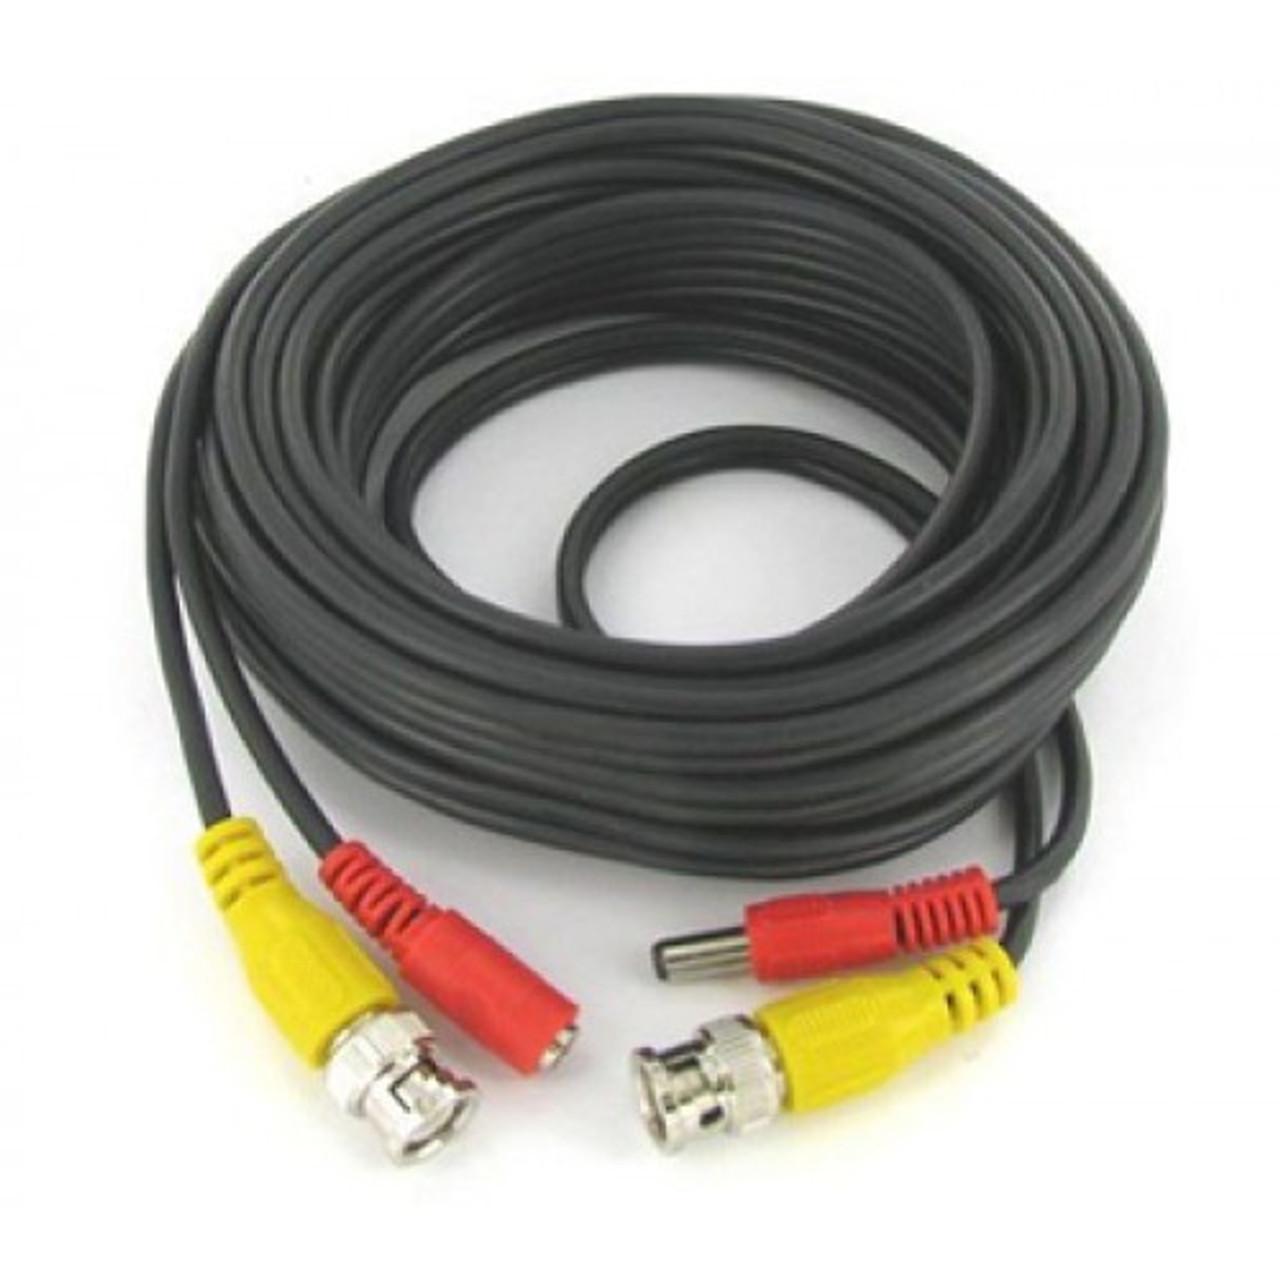 Części i akcesoria do systemów monitorowania 2 Unit Samsung HD BNC Cable 60 Ft for CCTV Surveillance Camera